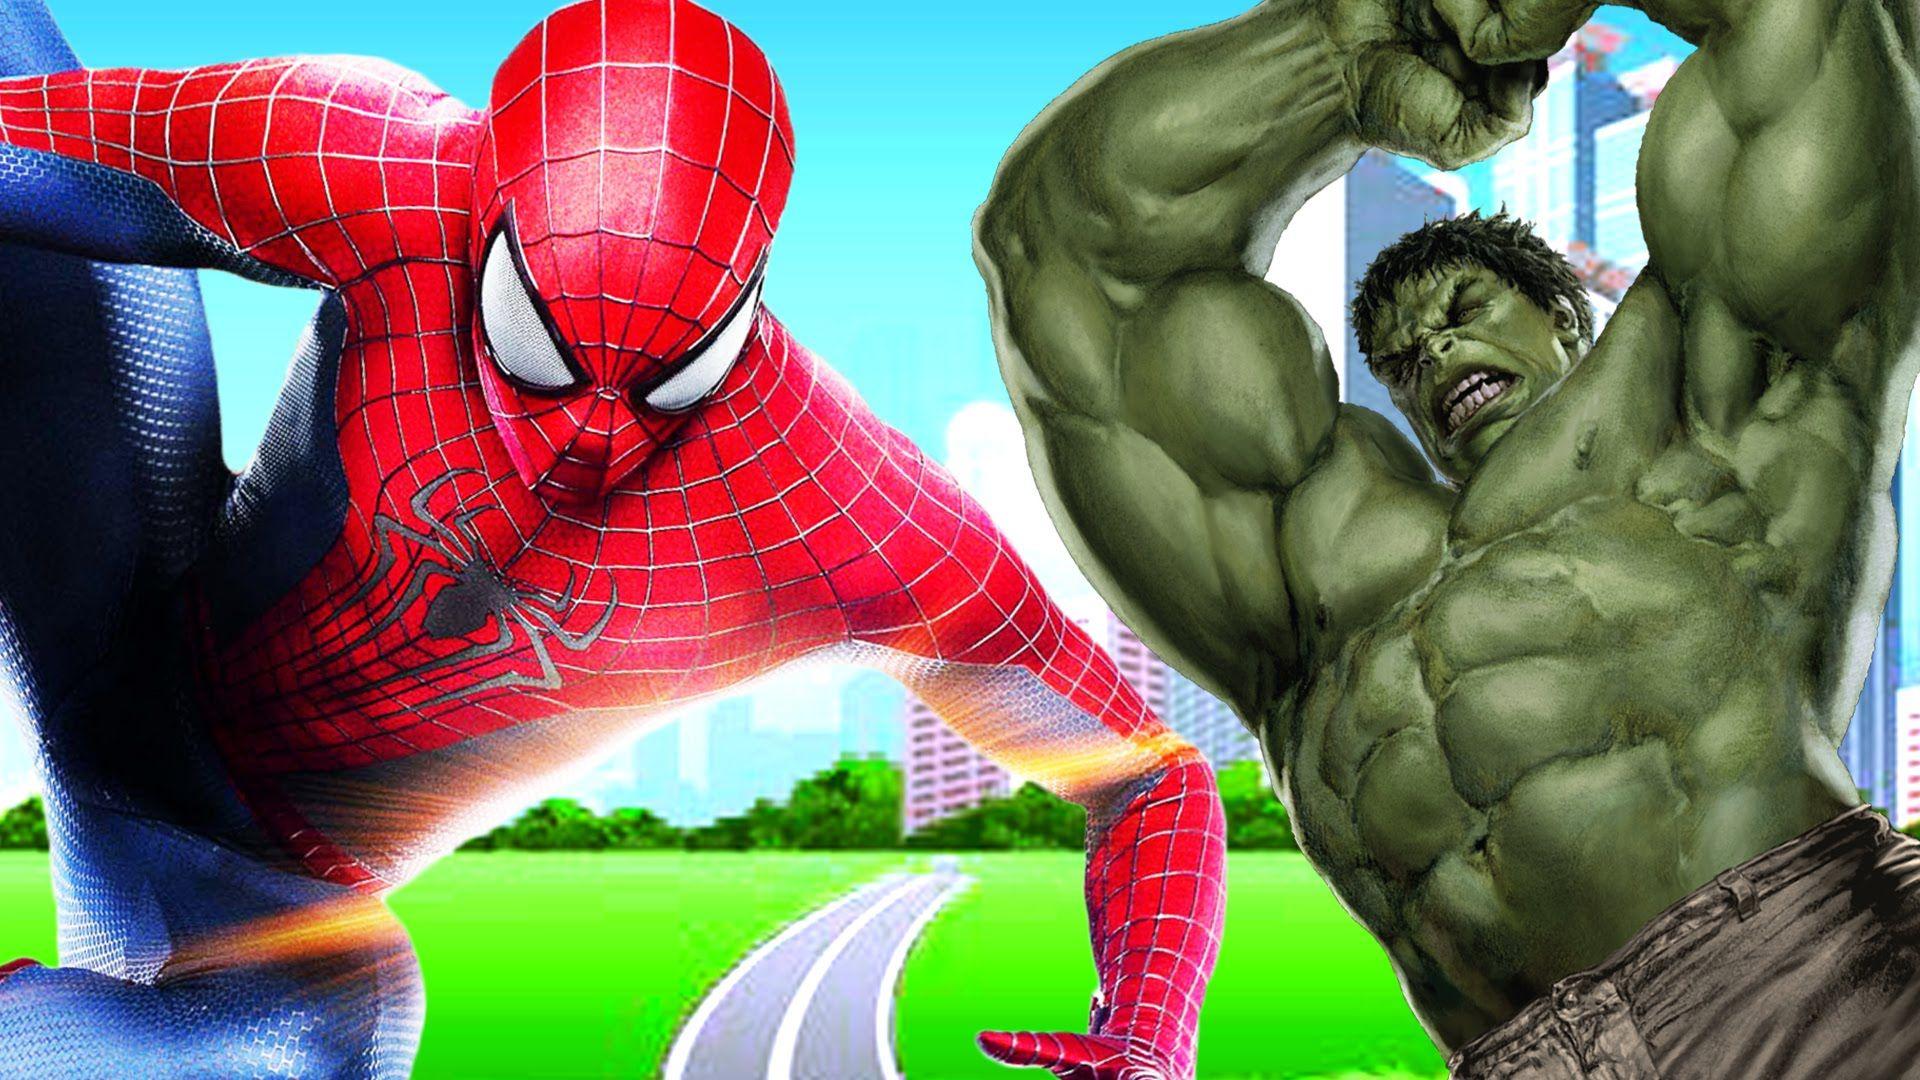 spiderman amp hulk amazing fights spiderman vs hulk